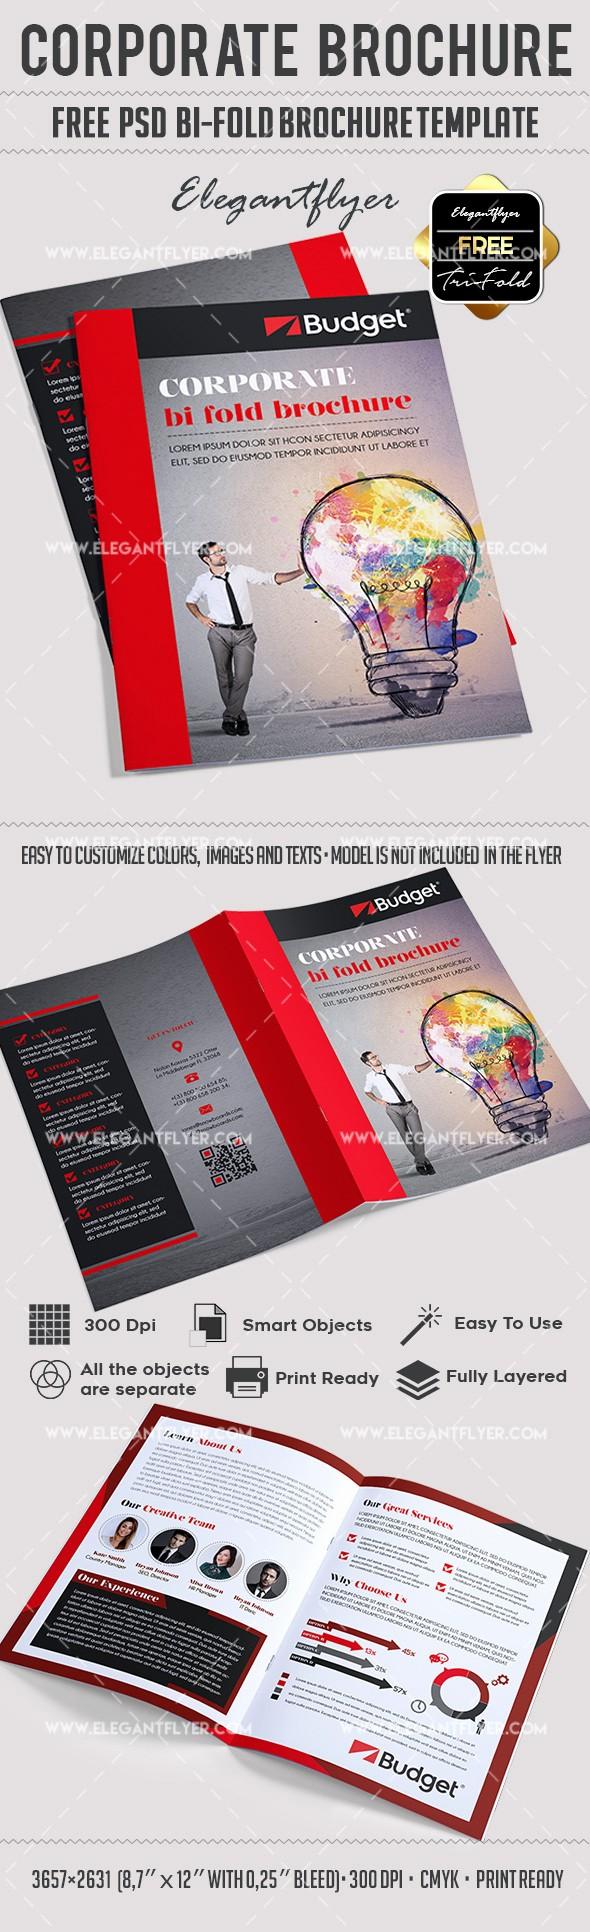 Bi-fold Brochure Template Beautiful Corporate – Free Psd Bi Fold Psd Brochure Template – by